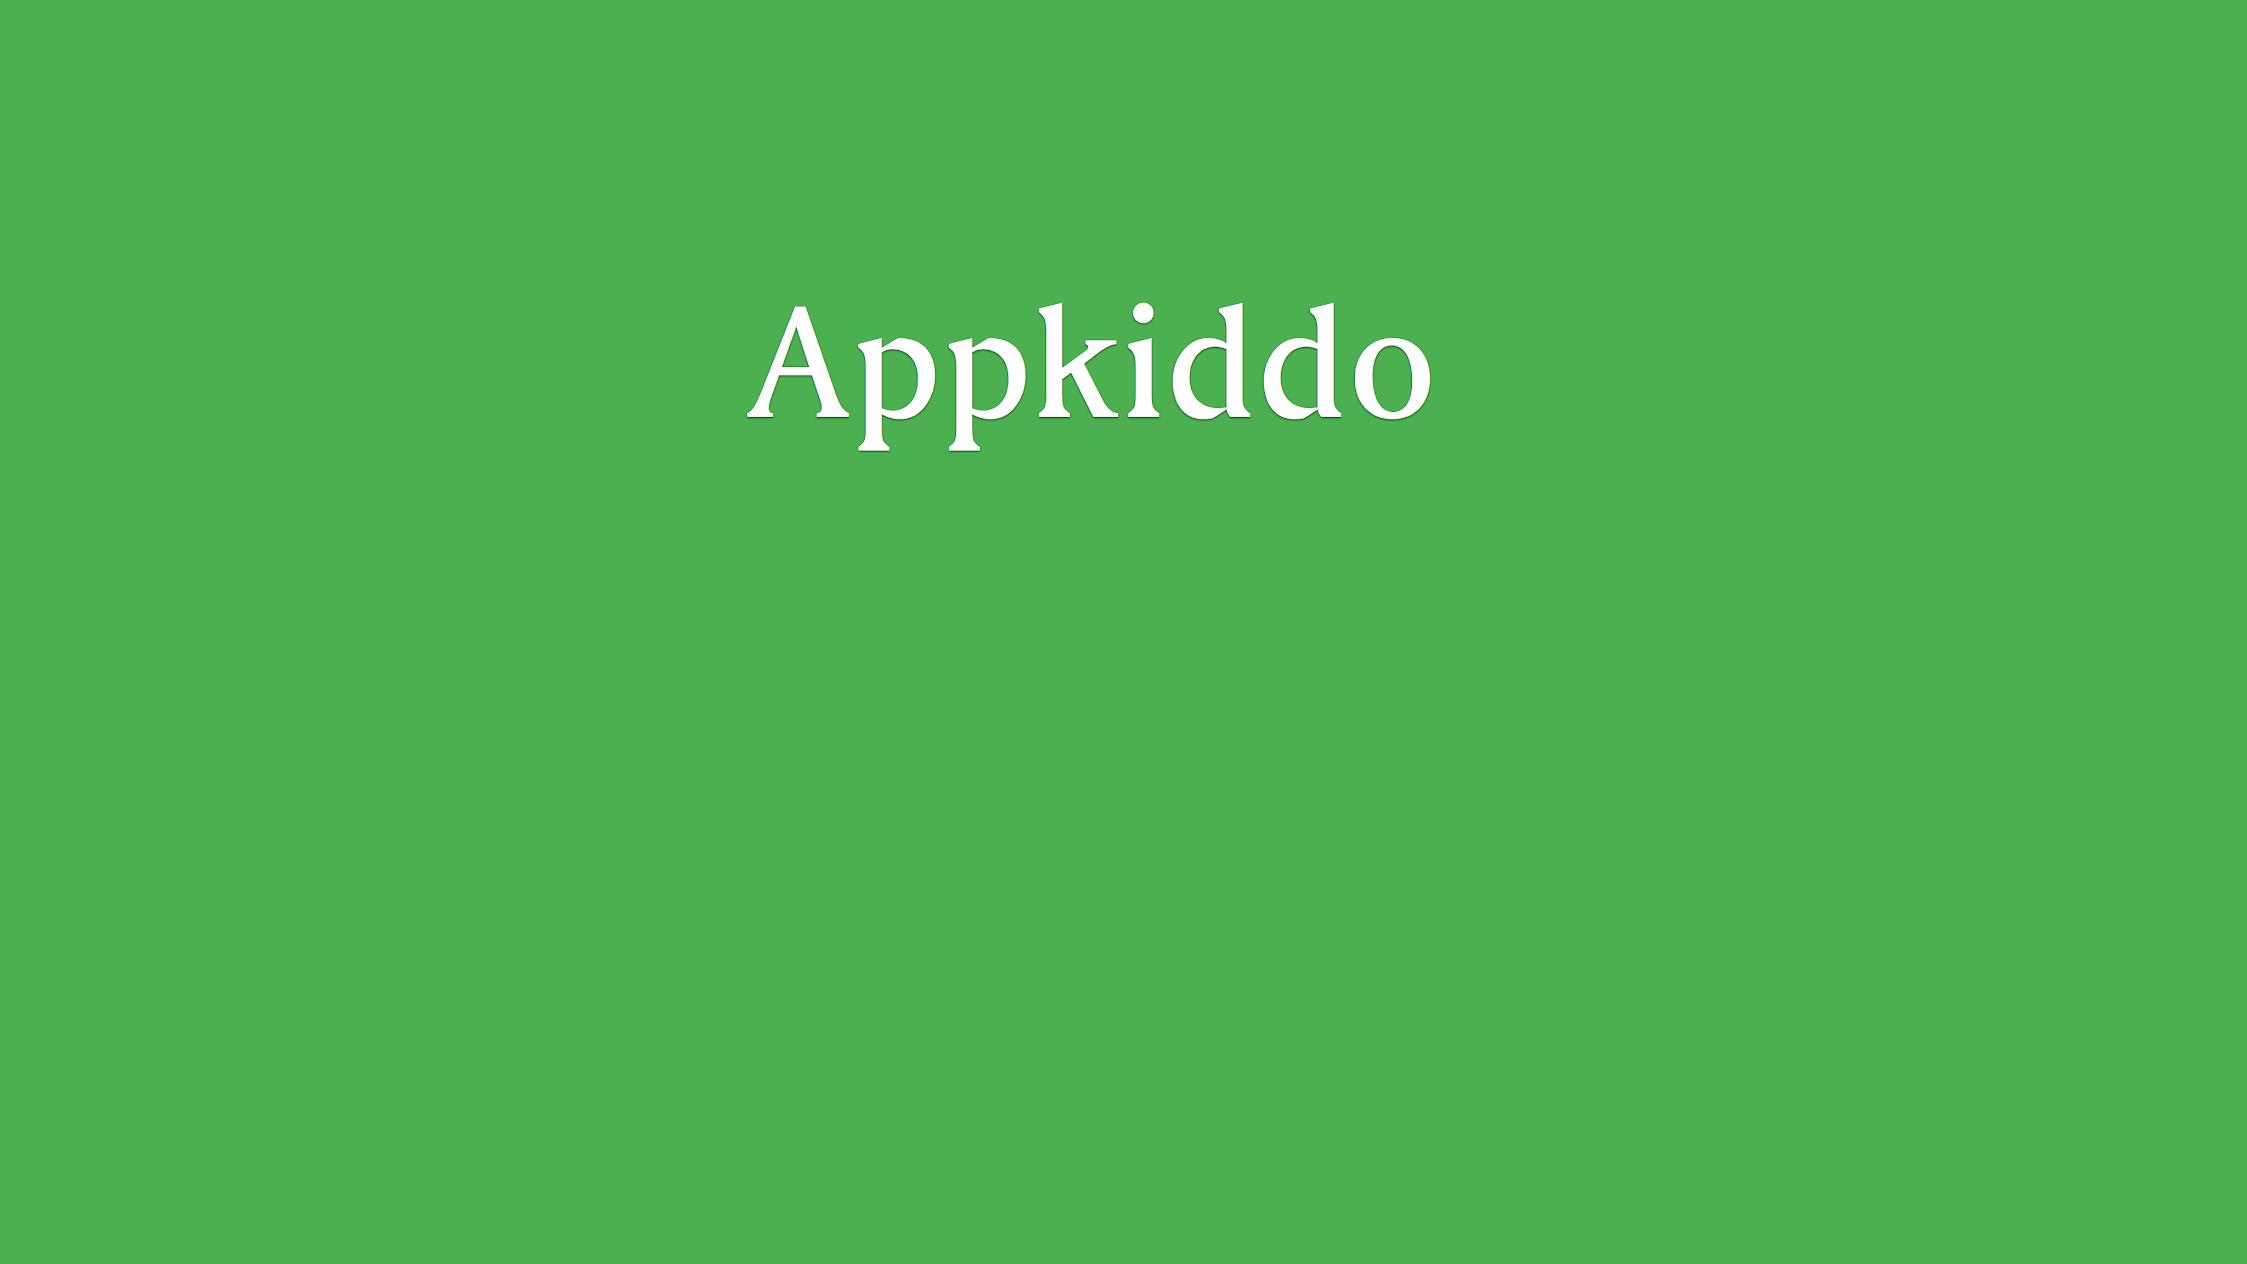 AppKiddo